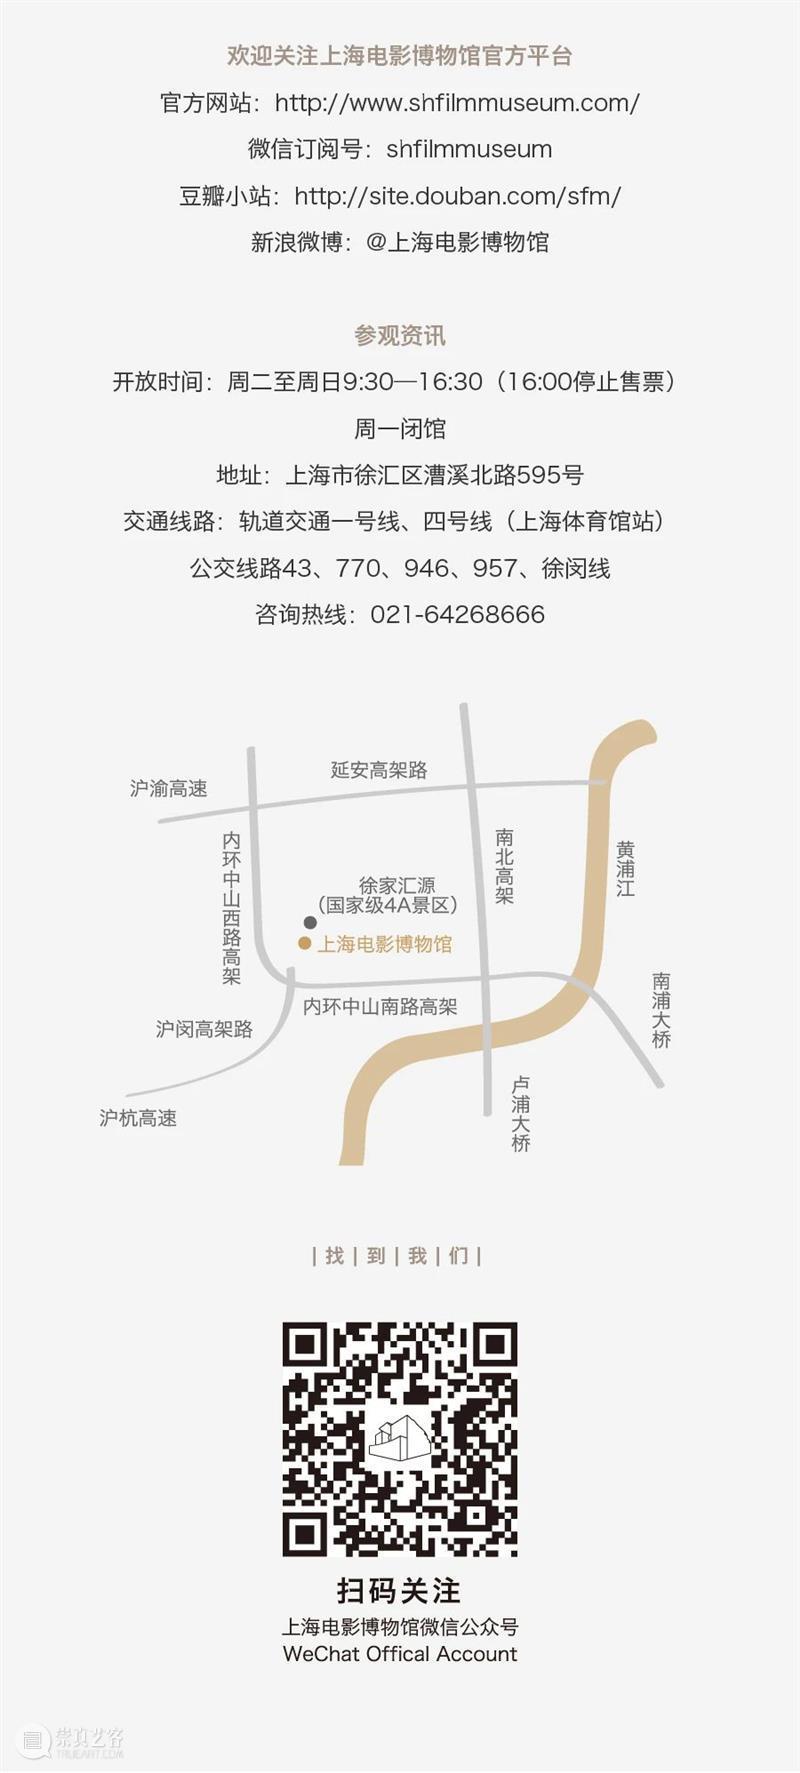 "SFM·595微电台   VOL131:""最美童声""闪耀归来,五一假期有点HIGH 童声 假期 SFM 微电台 VOL 上海电影博物馆 中国电影博物馆 活动 全国 少年儿童 崇真艺客"